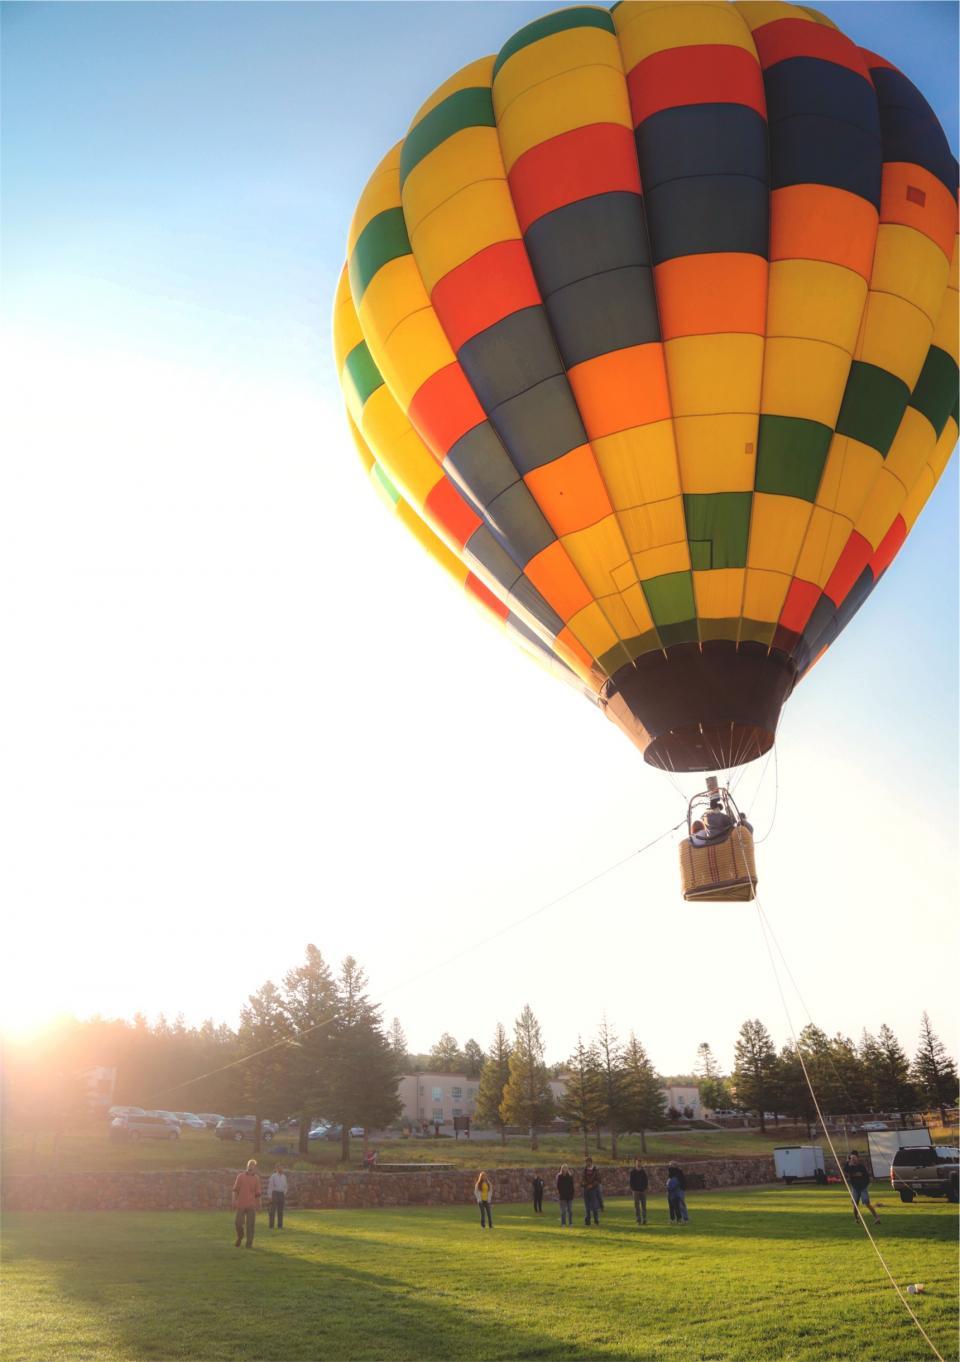 hot air balloon, grass, people